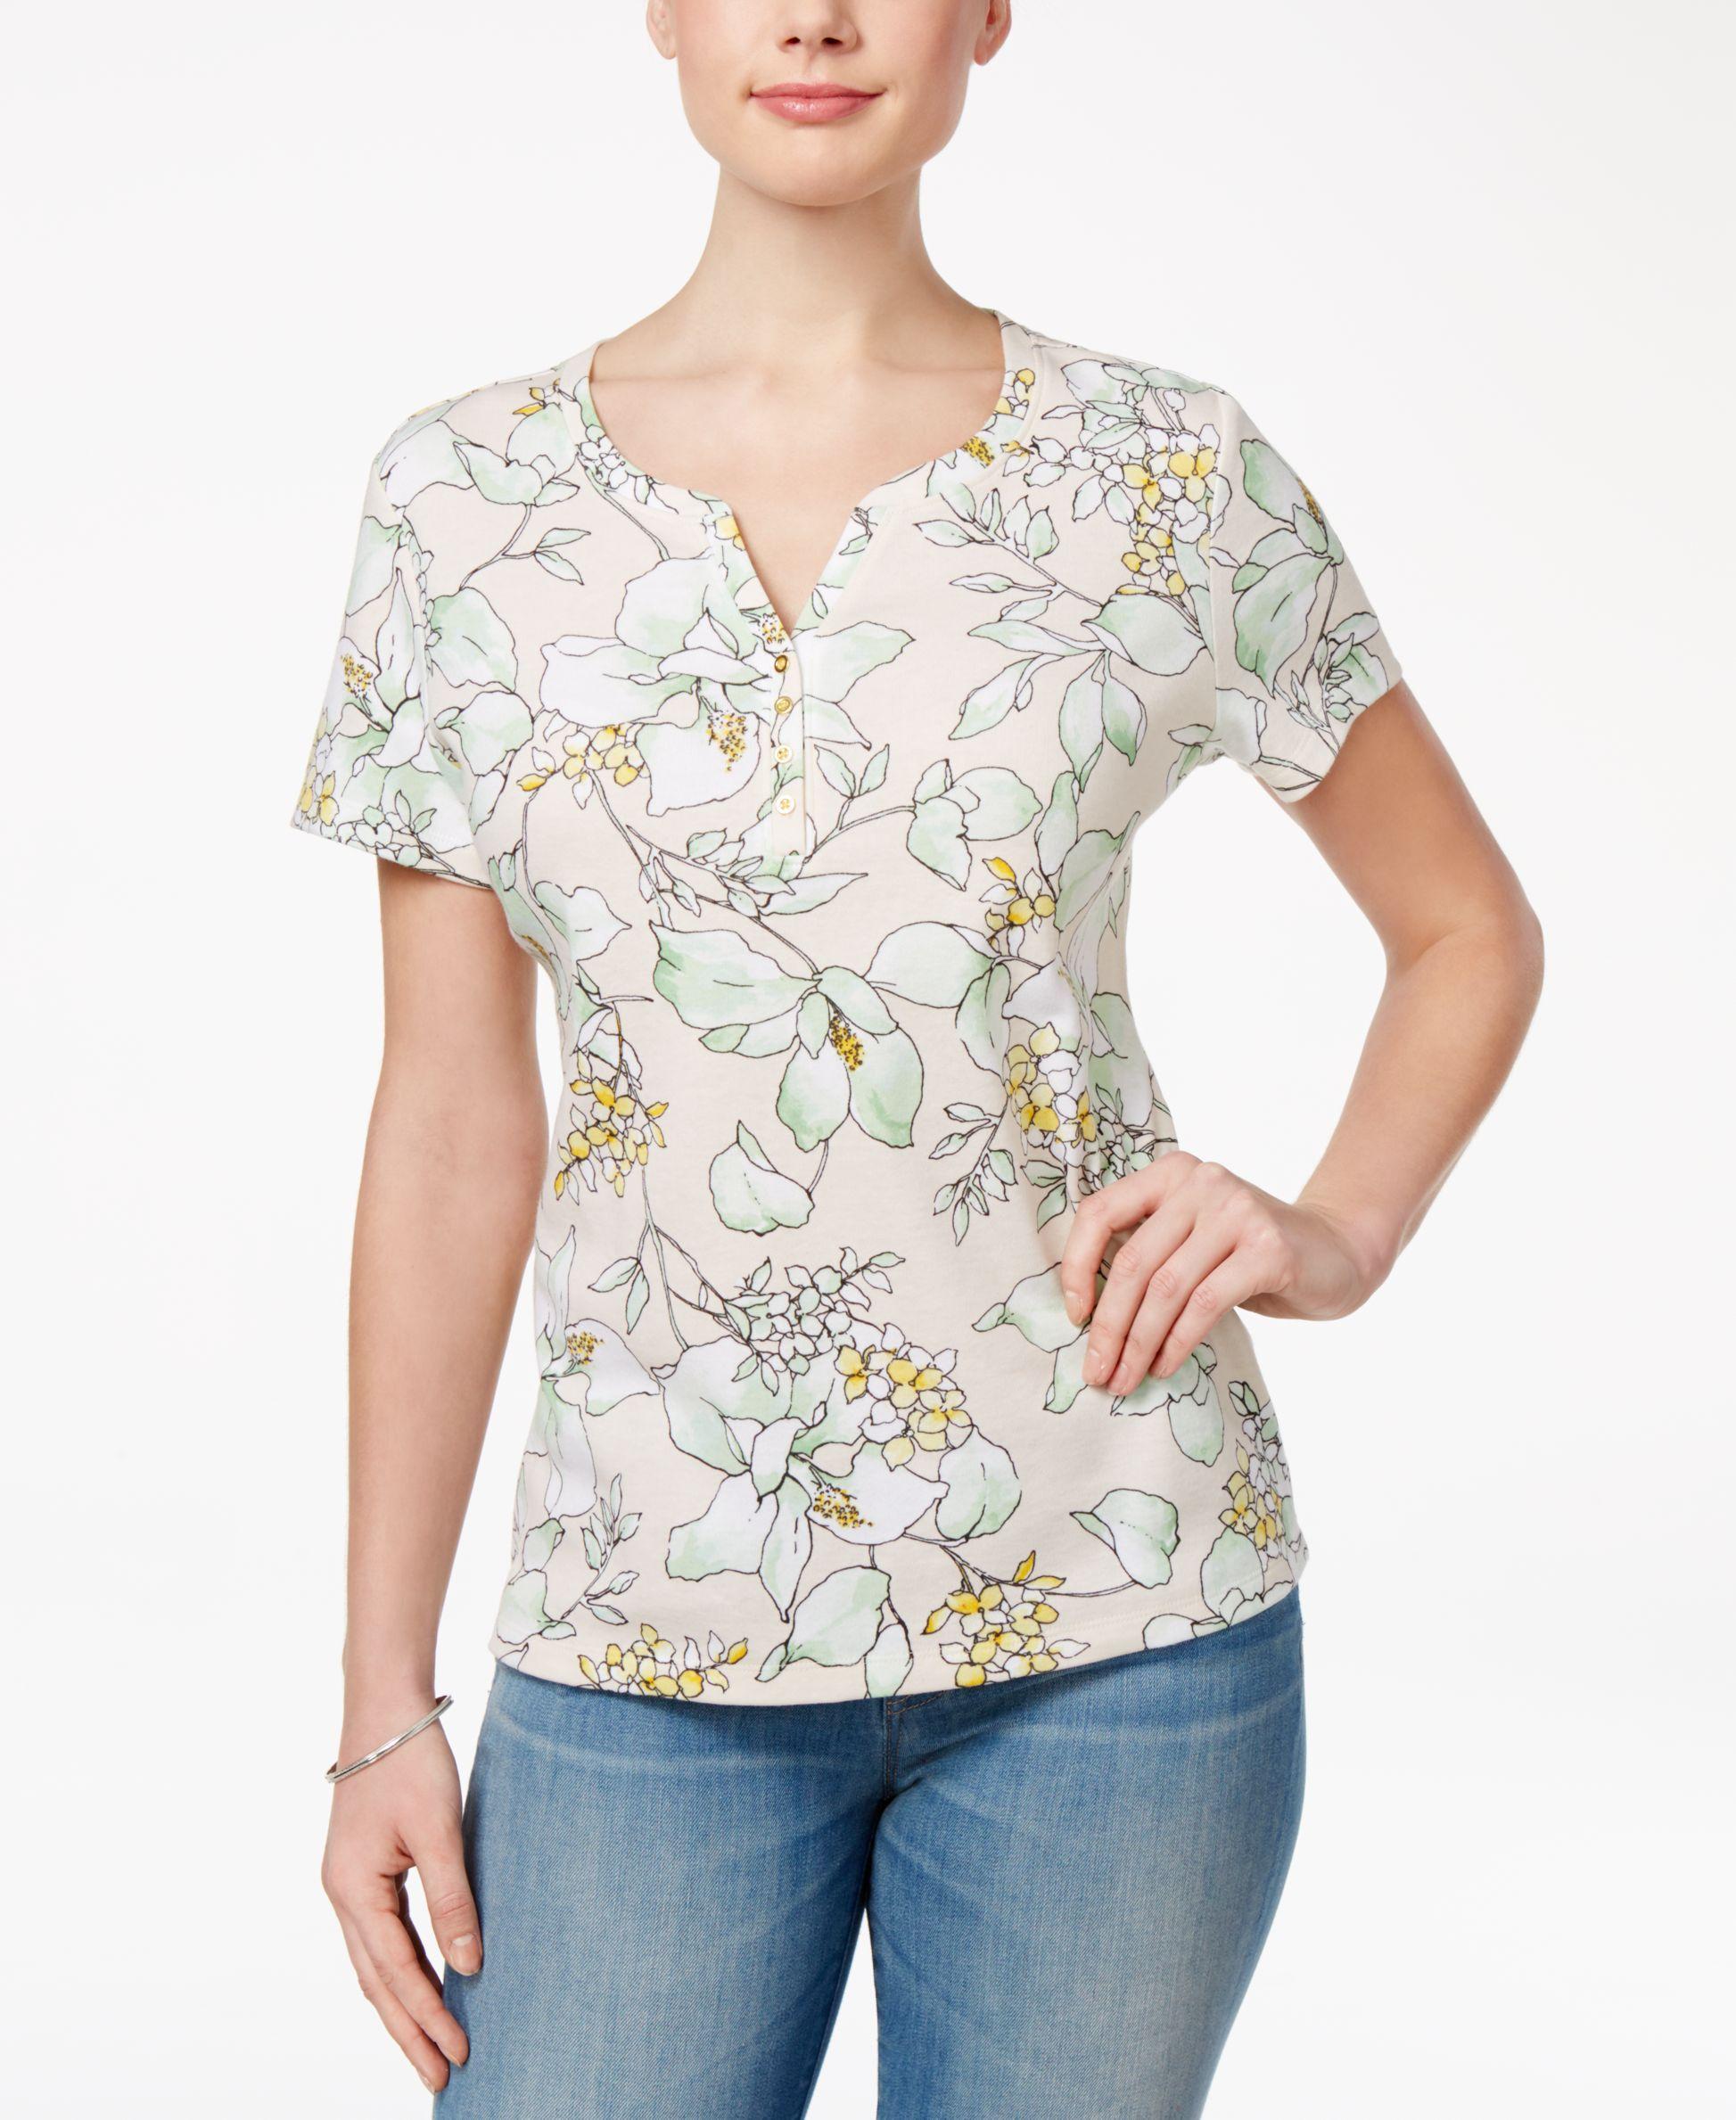 cbc16db1 Printed Henley T-Shirt, Created for Macy's | Karen scott, Henleys ...